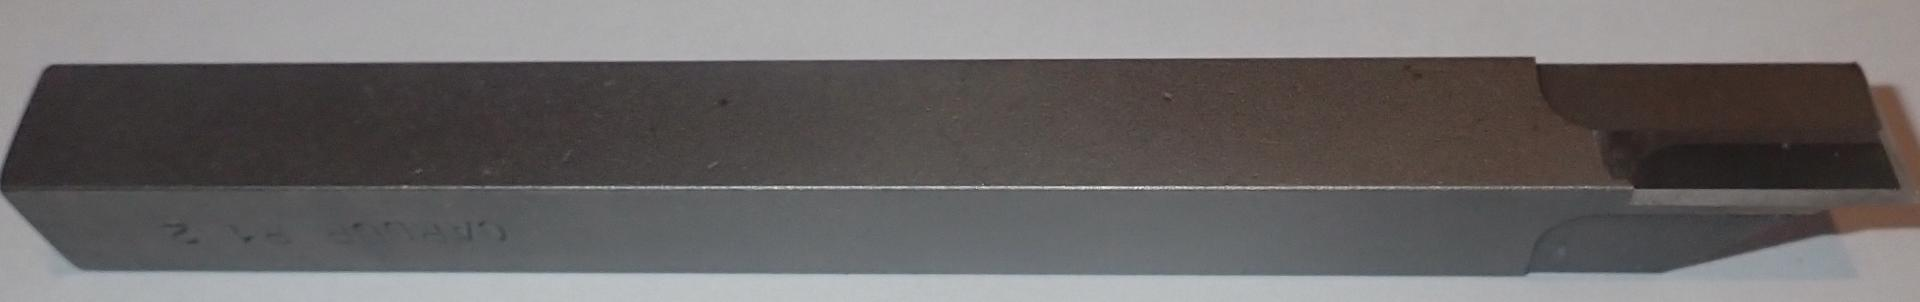 P8160003